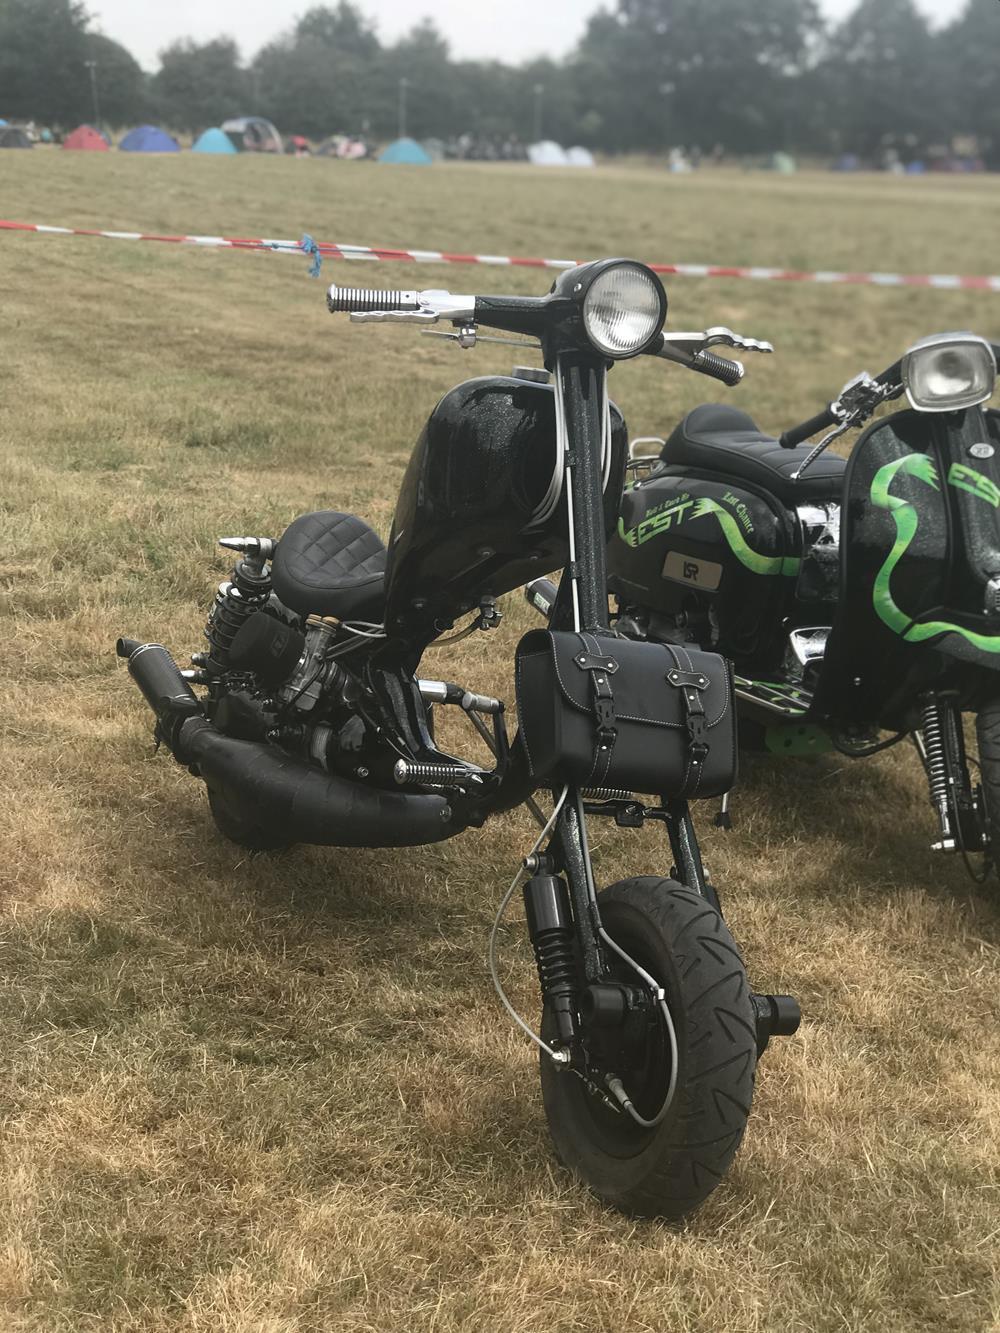 Bllack Lambretta chopper